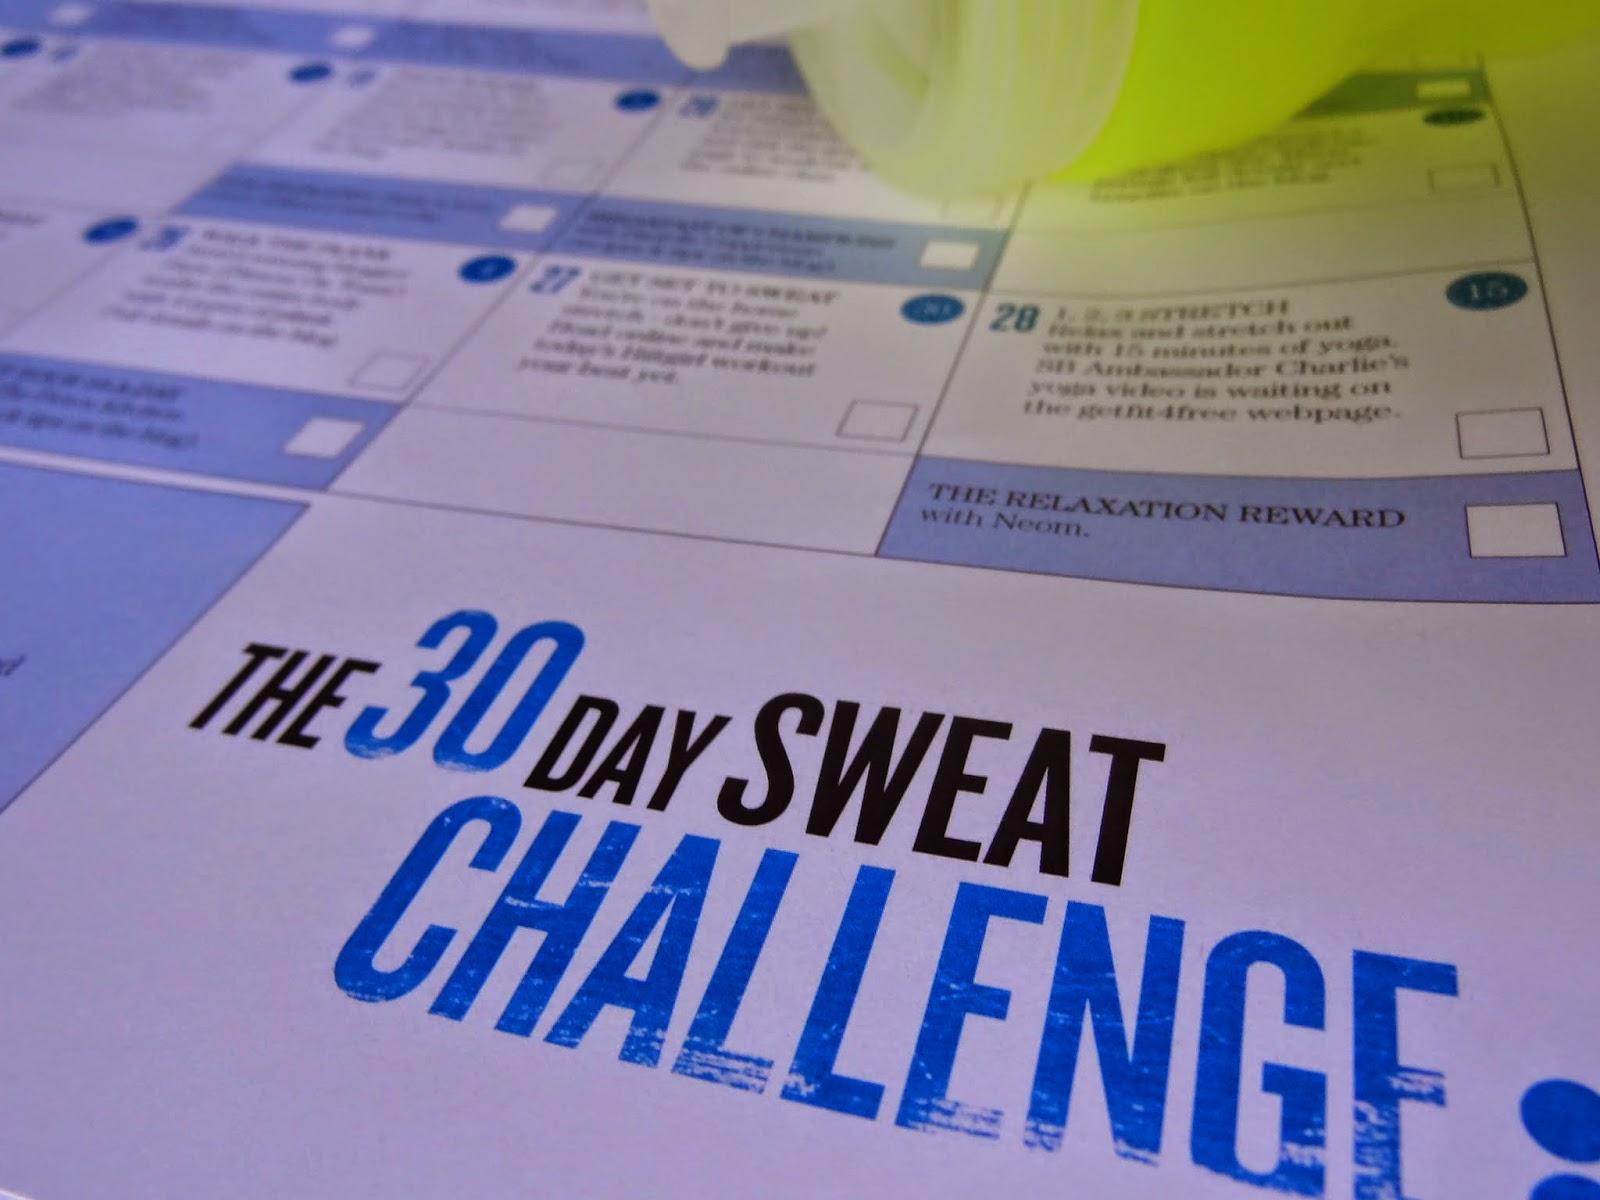 Sweaty Betty GF4F 30 Day Sweat Challenge Calendar